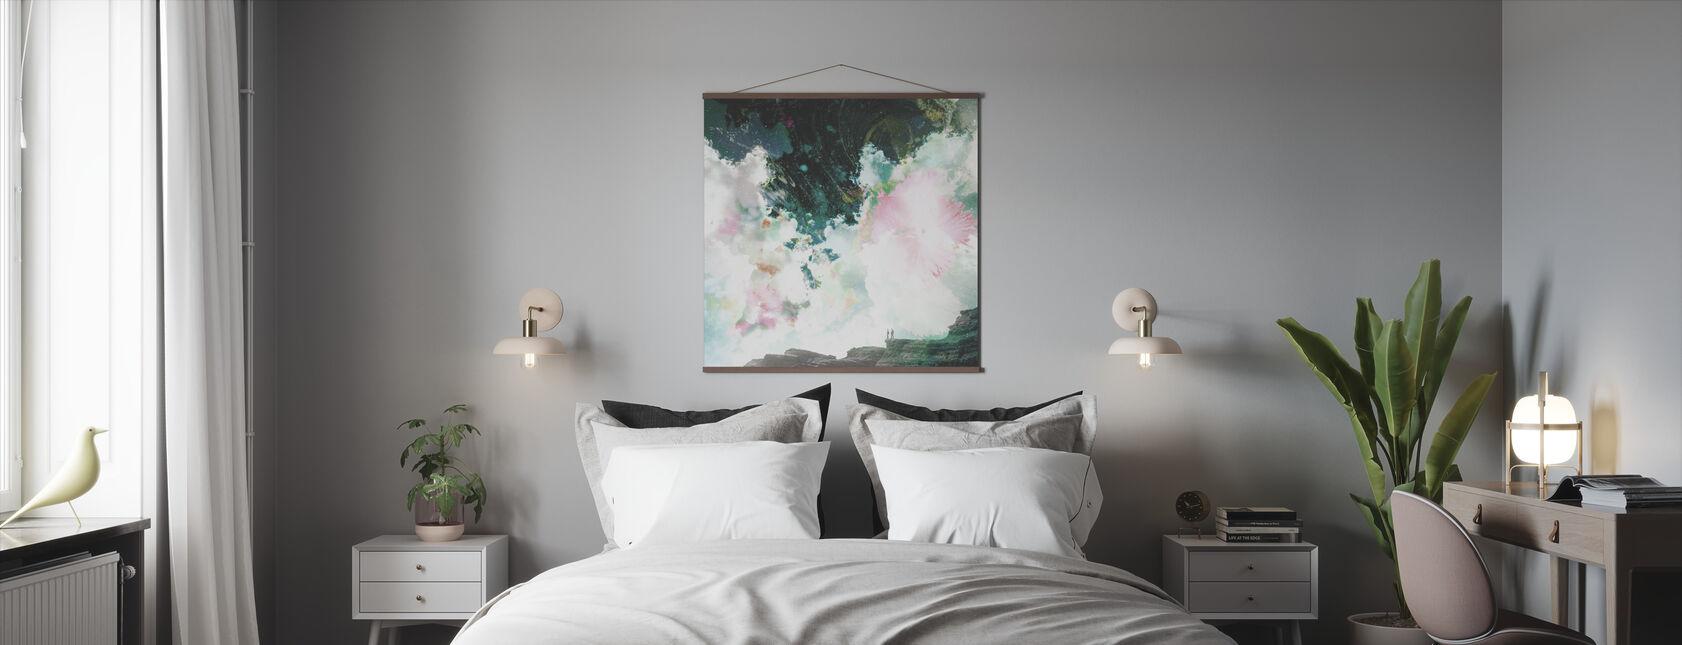 Coastline - Poster - Bedroom